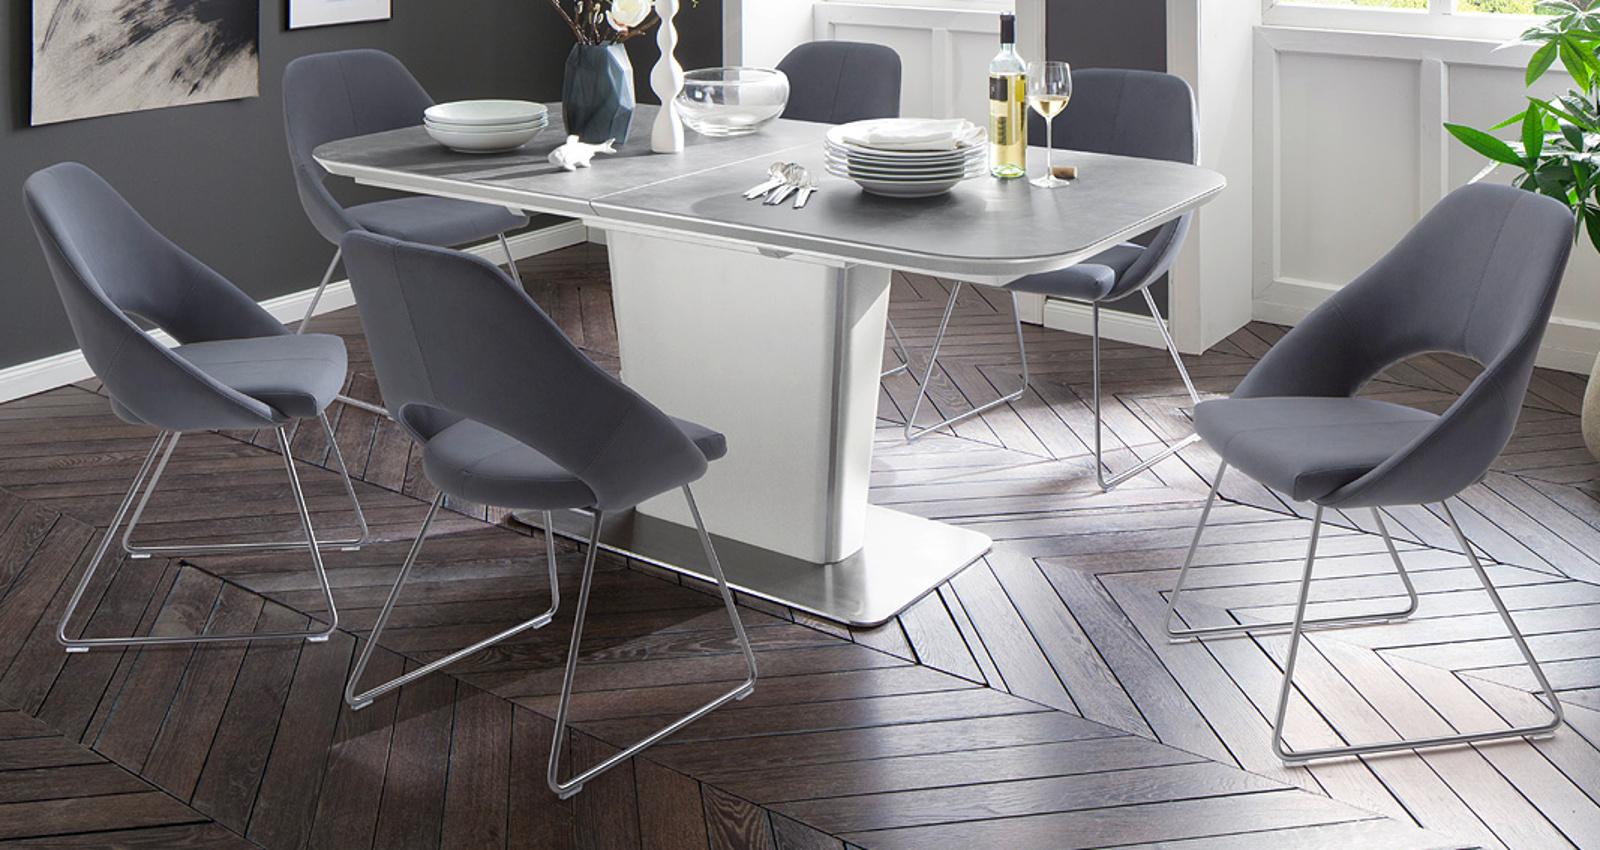 esstisch koami wei lack keramik grau 180 cm. Black Bedroom Furniture Sets. Home Design Ideas